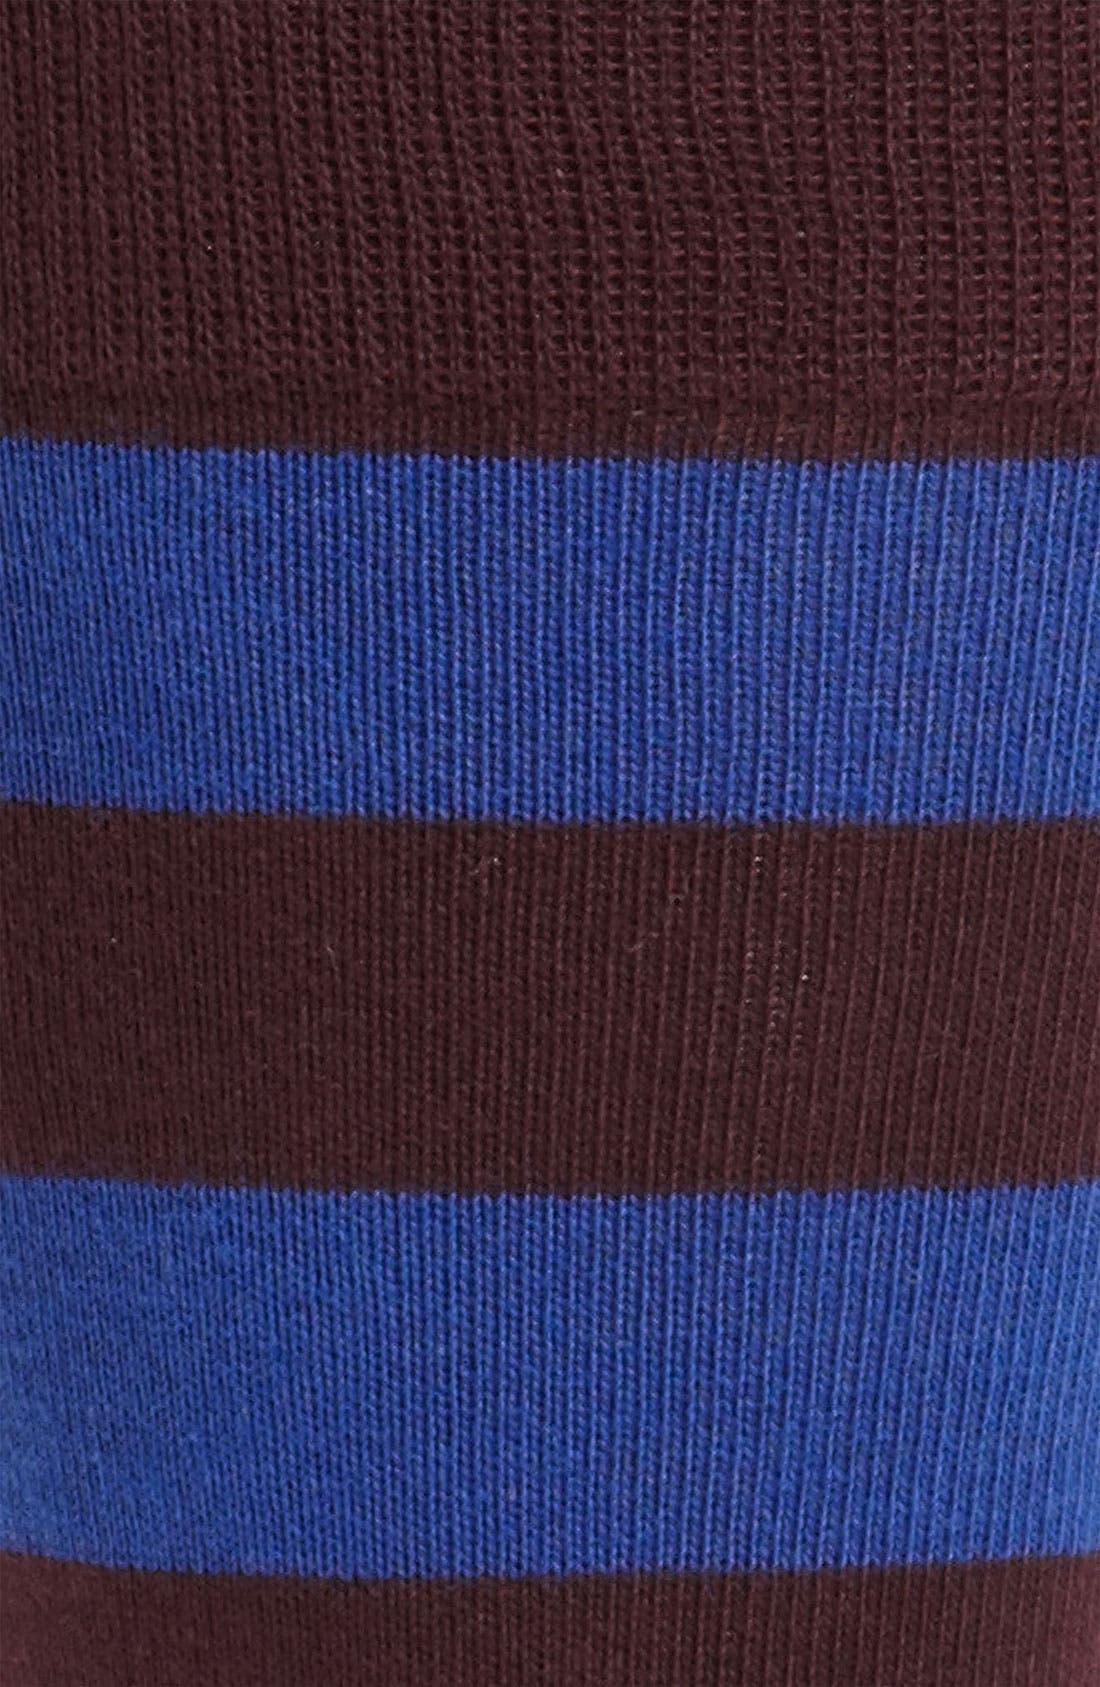 Cotton Blend Socks,                             Alternate thumbnail 34, color,